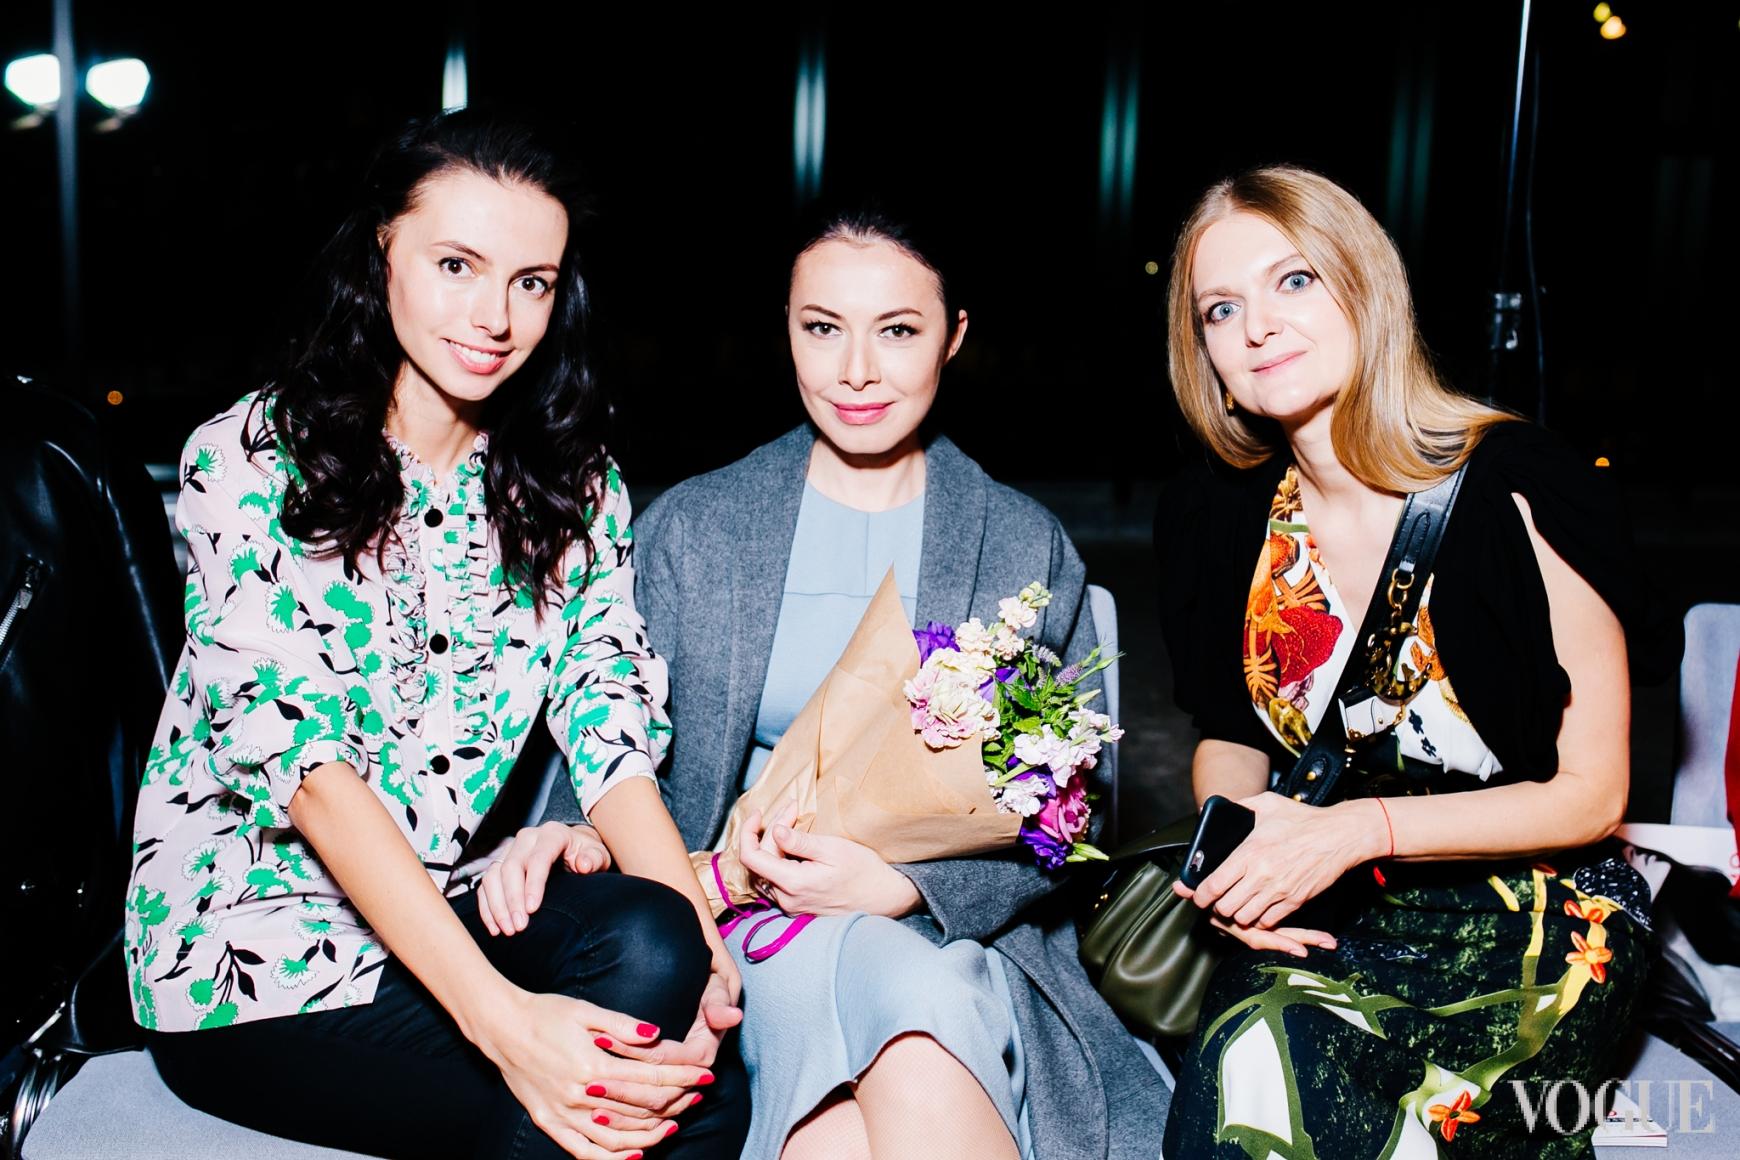 Надежда Елько, Тамила Немченко и Вера Титова